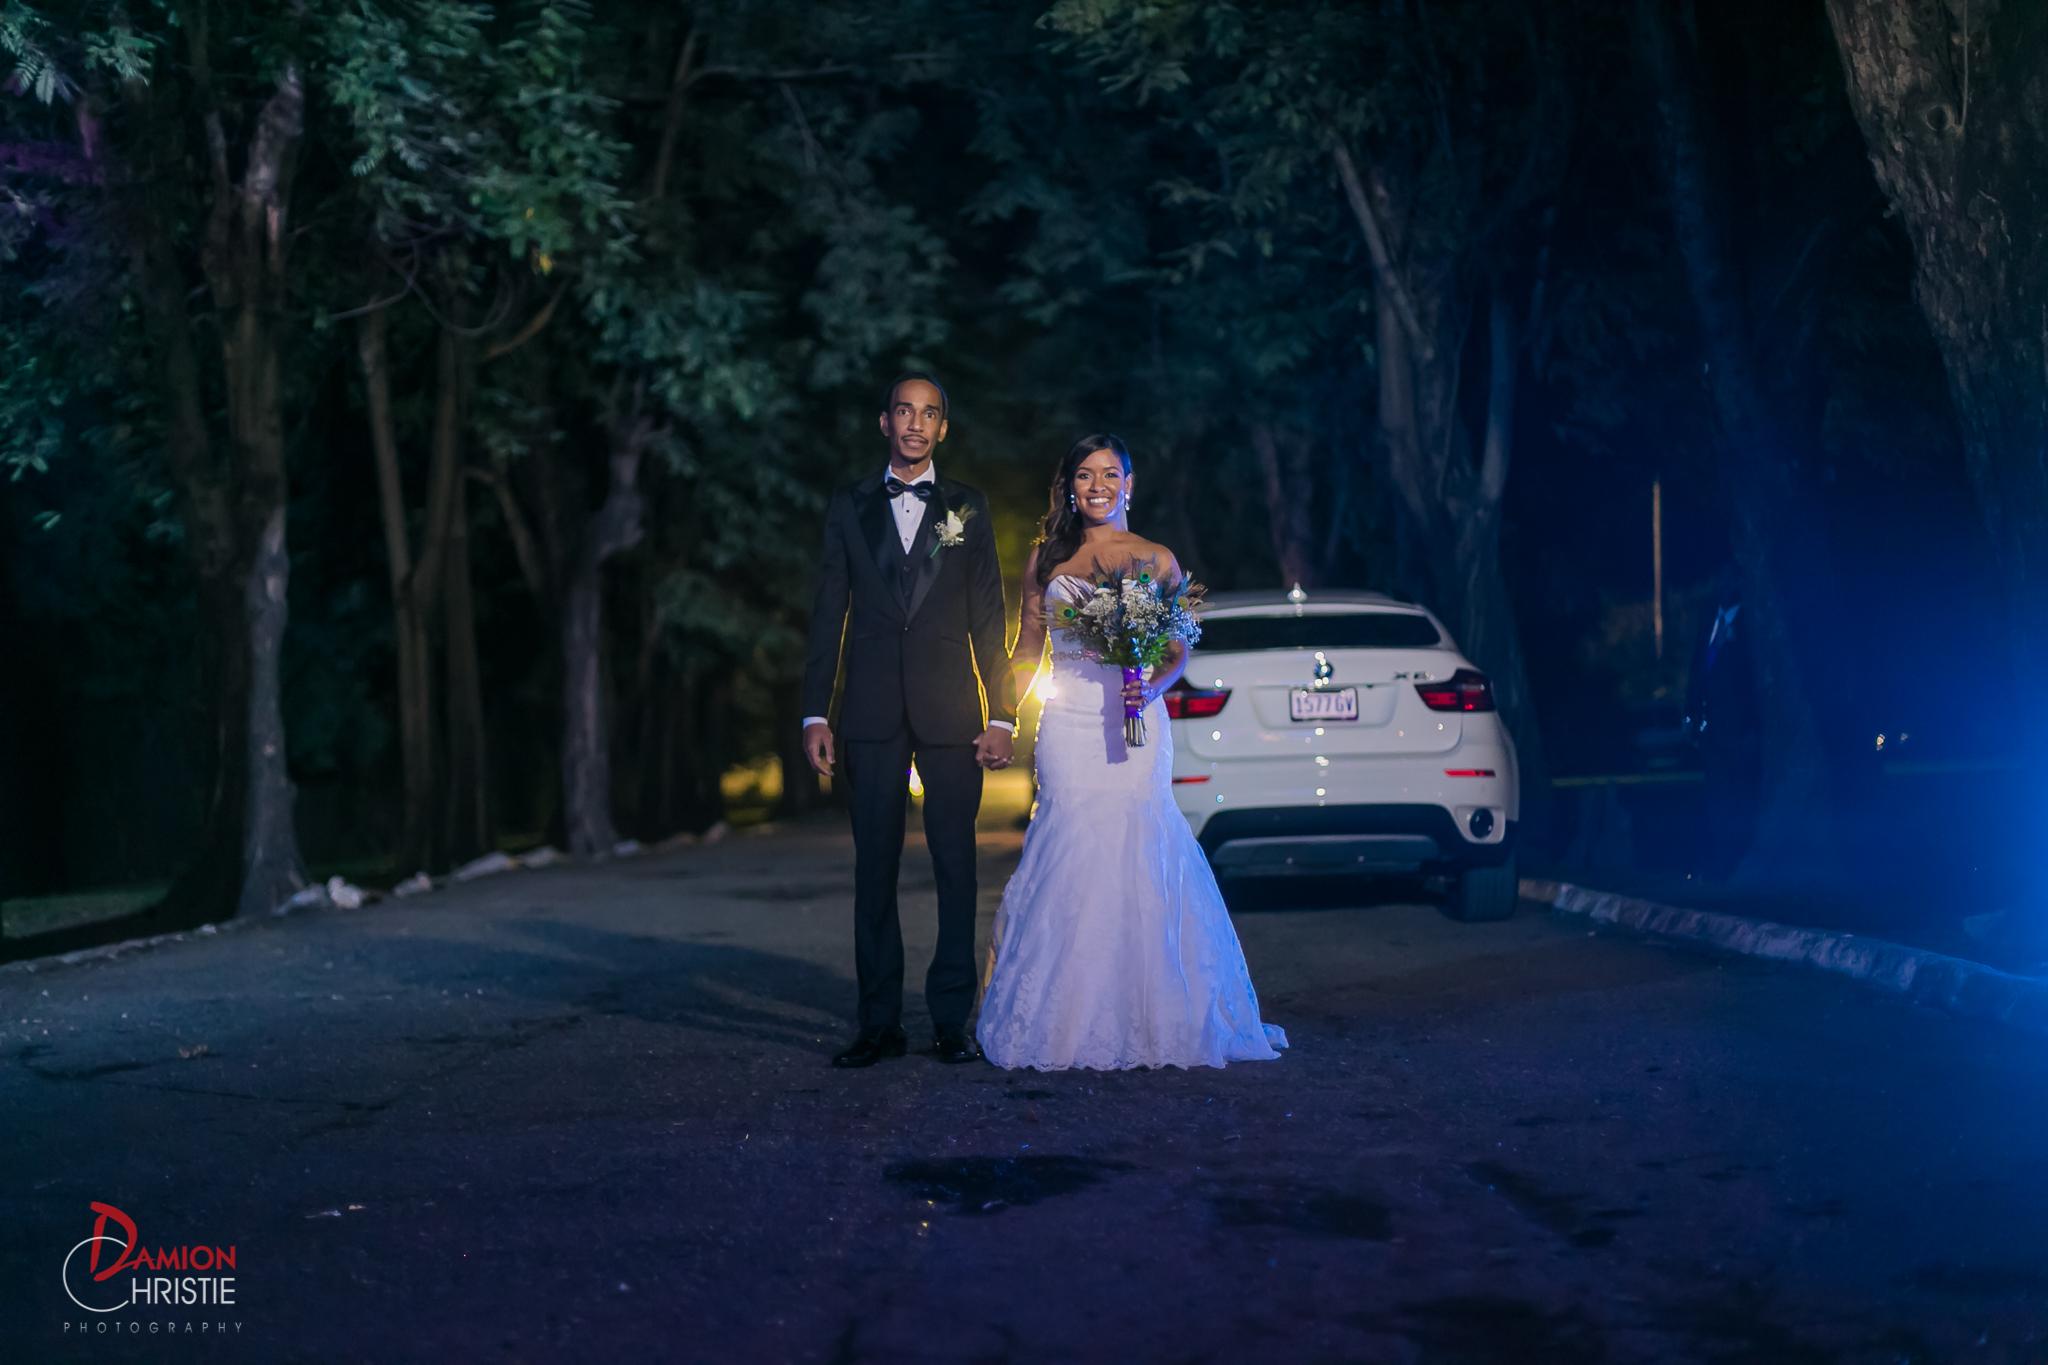 Henry & Amanda Wedding Day-21.jpg